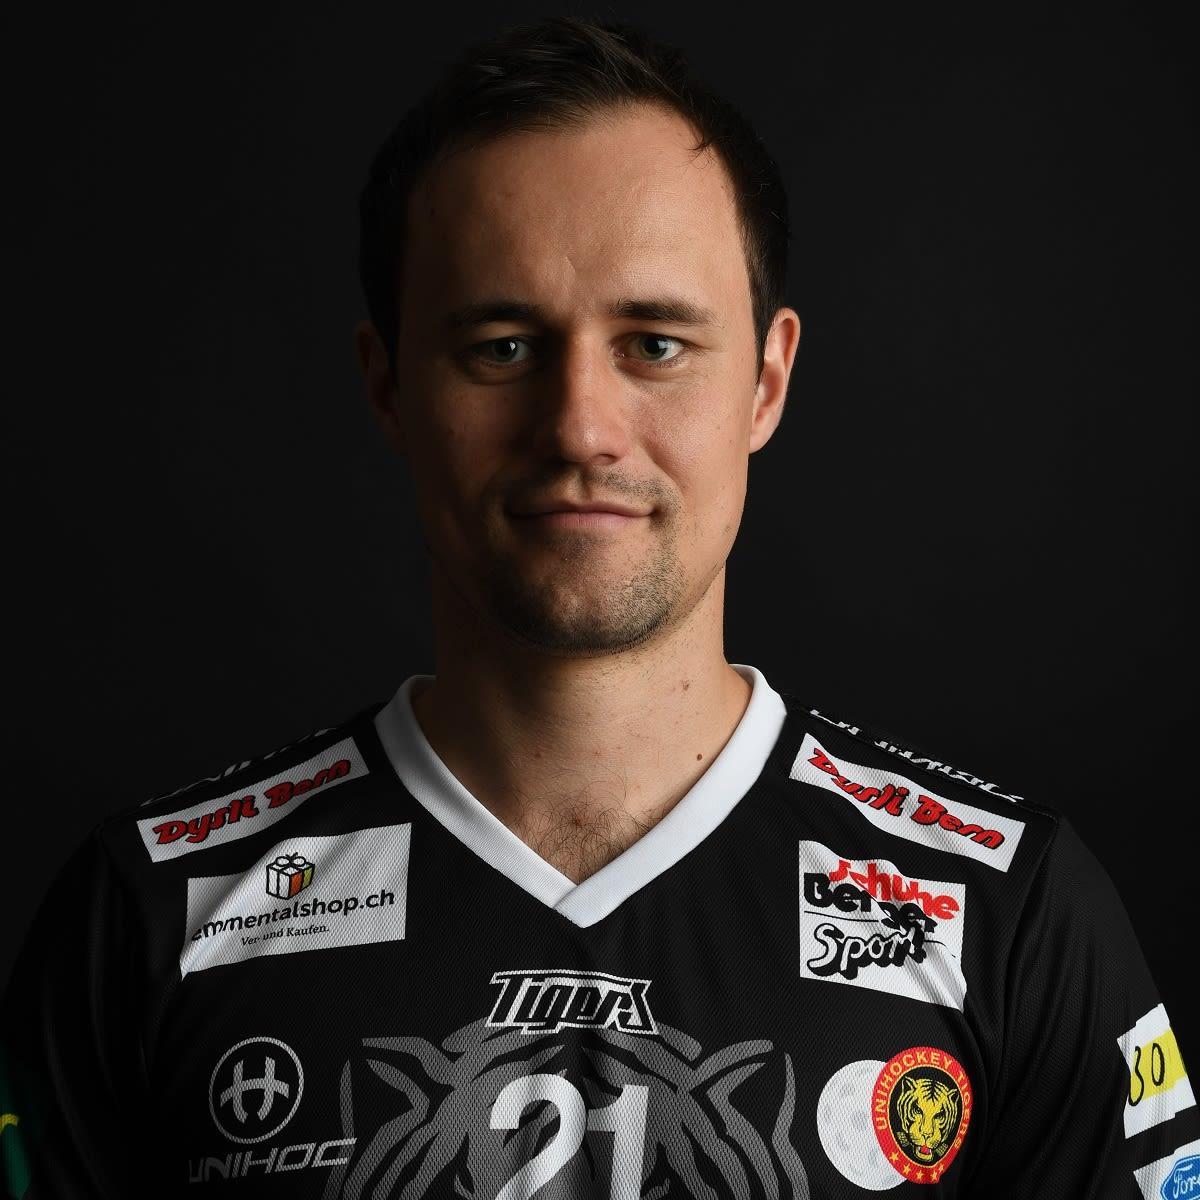 Lukas Meister